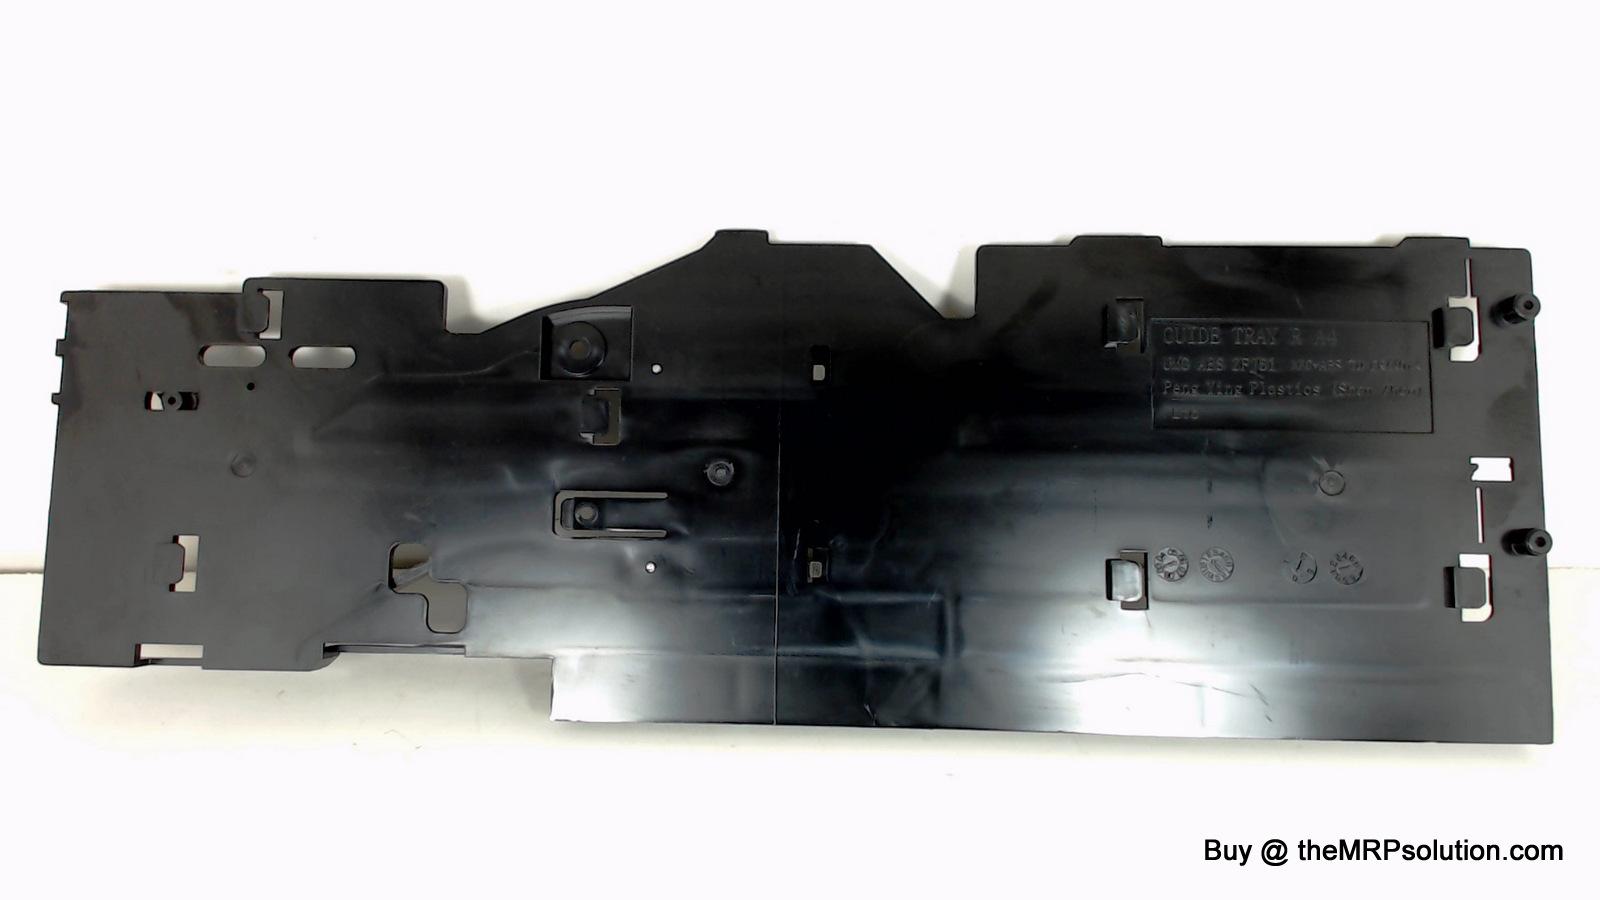 OKIDATA 51030695 GUIDE, TRAY RIGHT, B6300 Refurbished